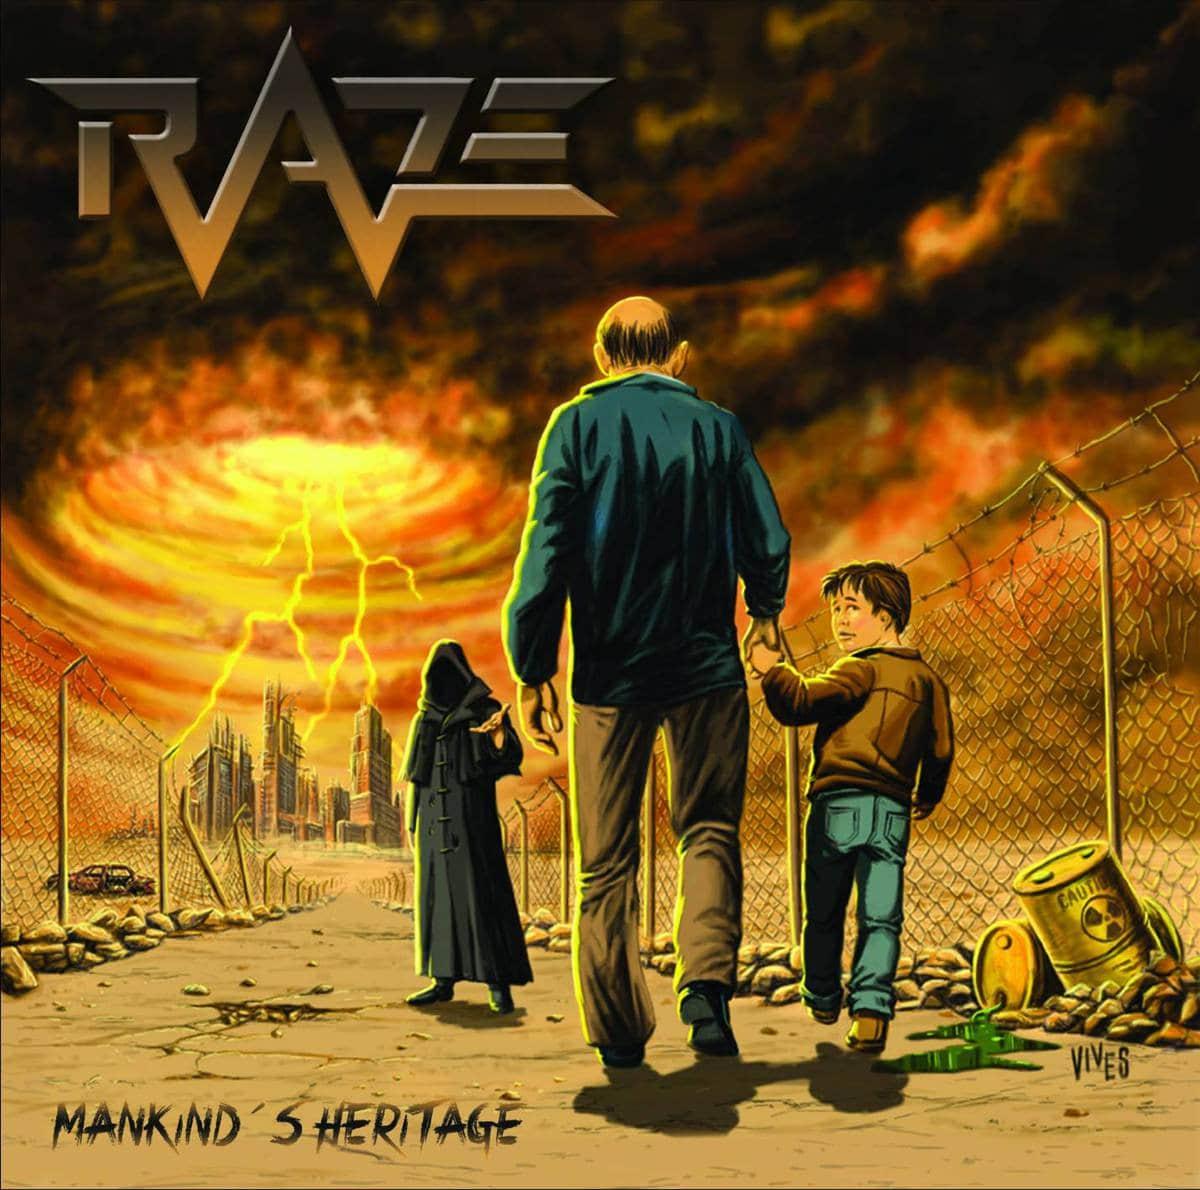 RAZE – Mankind's heritage, 2015